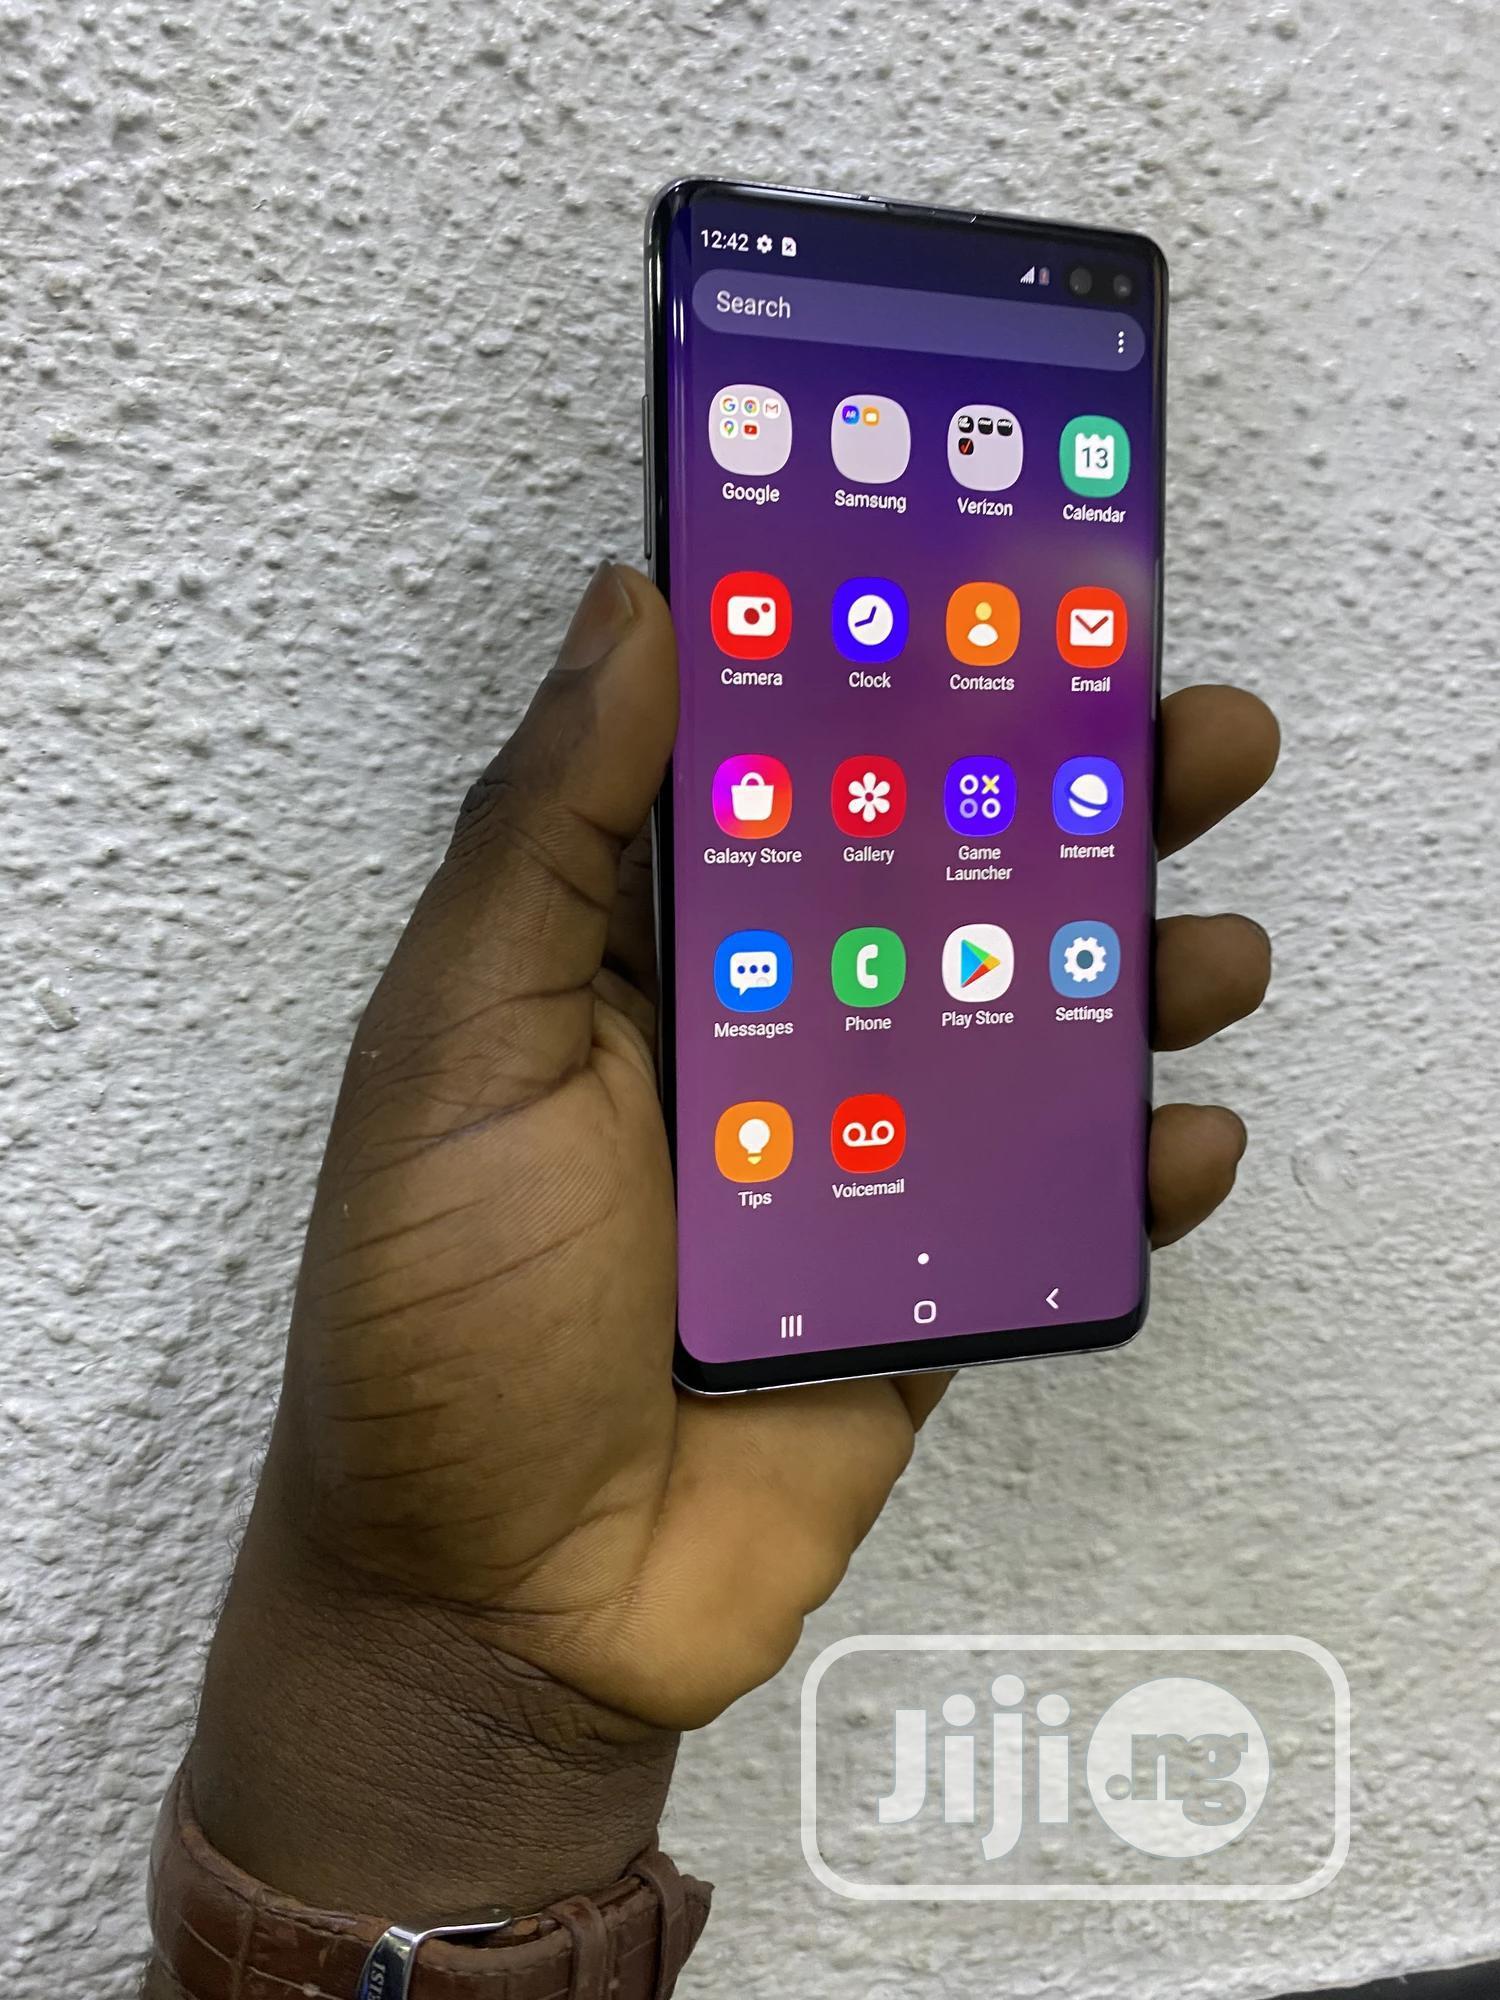 Samsung Galaxy S10 Plus 128 GB Black | Mobile Phones for sale in Ikeja, Lagos State, Nigeria